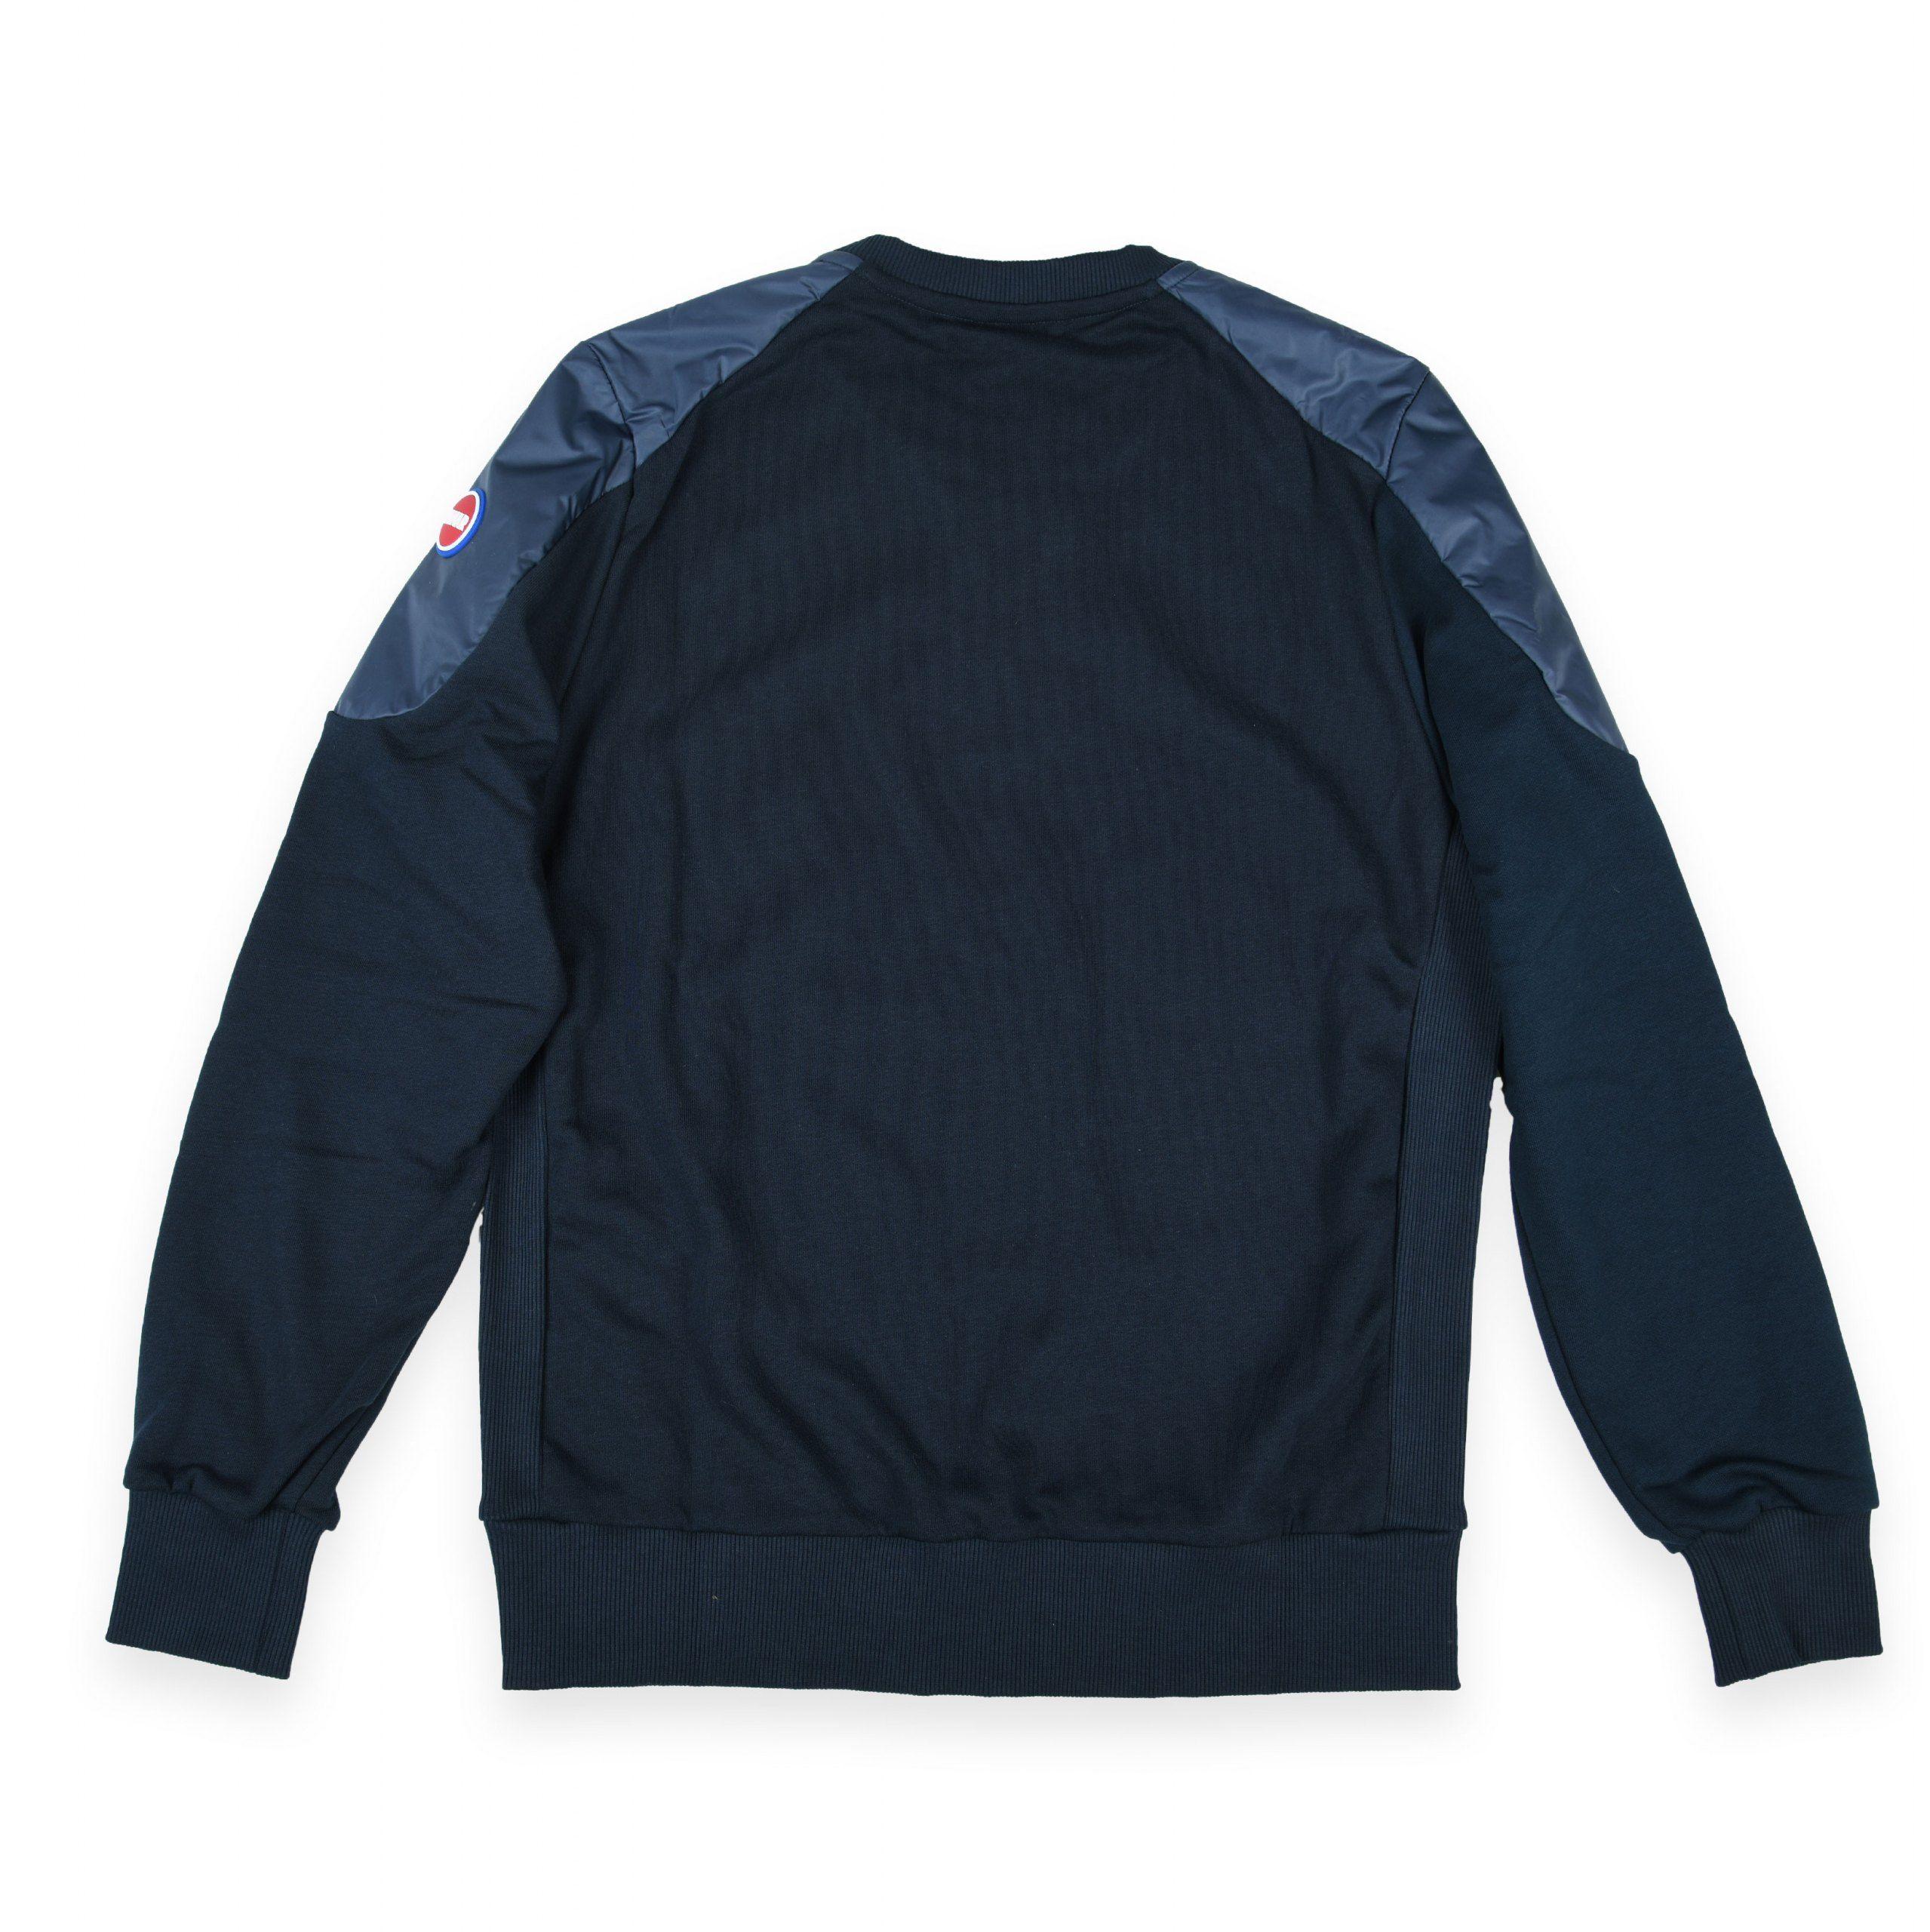 Poloshow Colmar Sweater Dunkelblau 68 8224 6QC 2